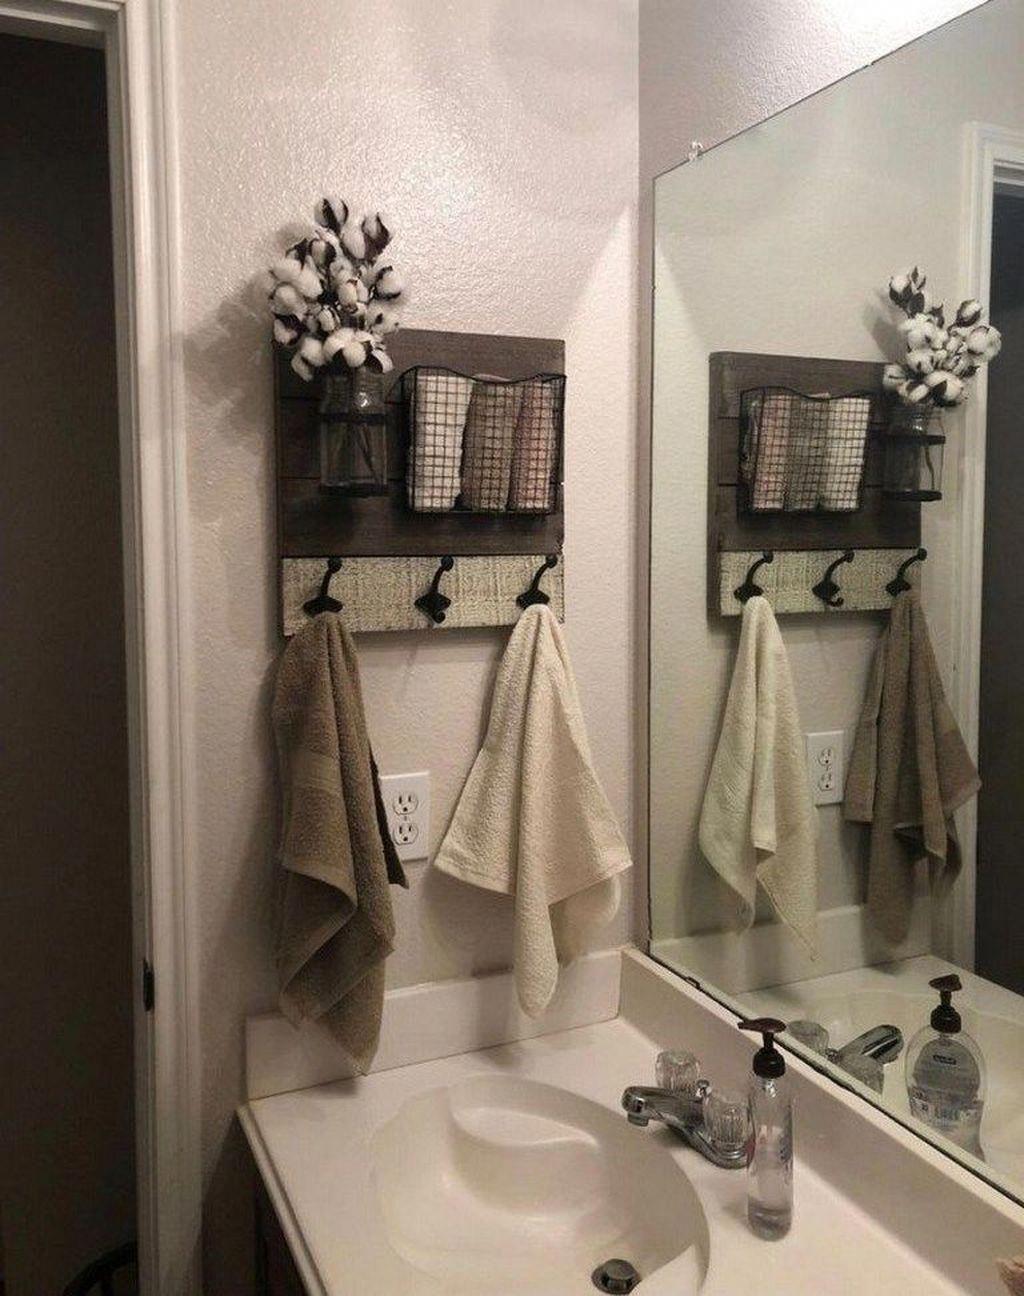 Bathroom Categories : Decor. Beautiful. Design. Bathroom. in 2020 | Small  bathroom decor, Diy bathroom storage, Bathroom decor